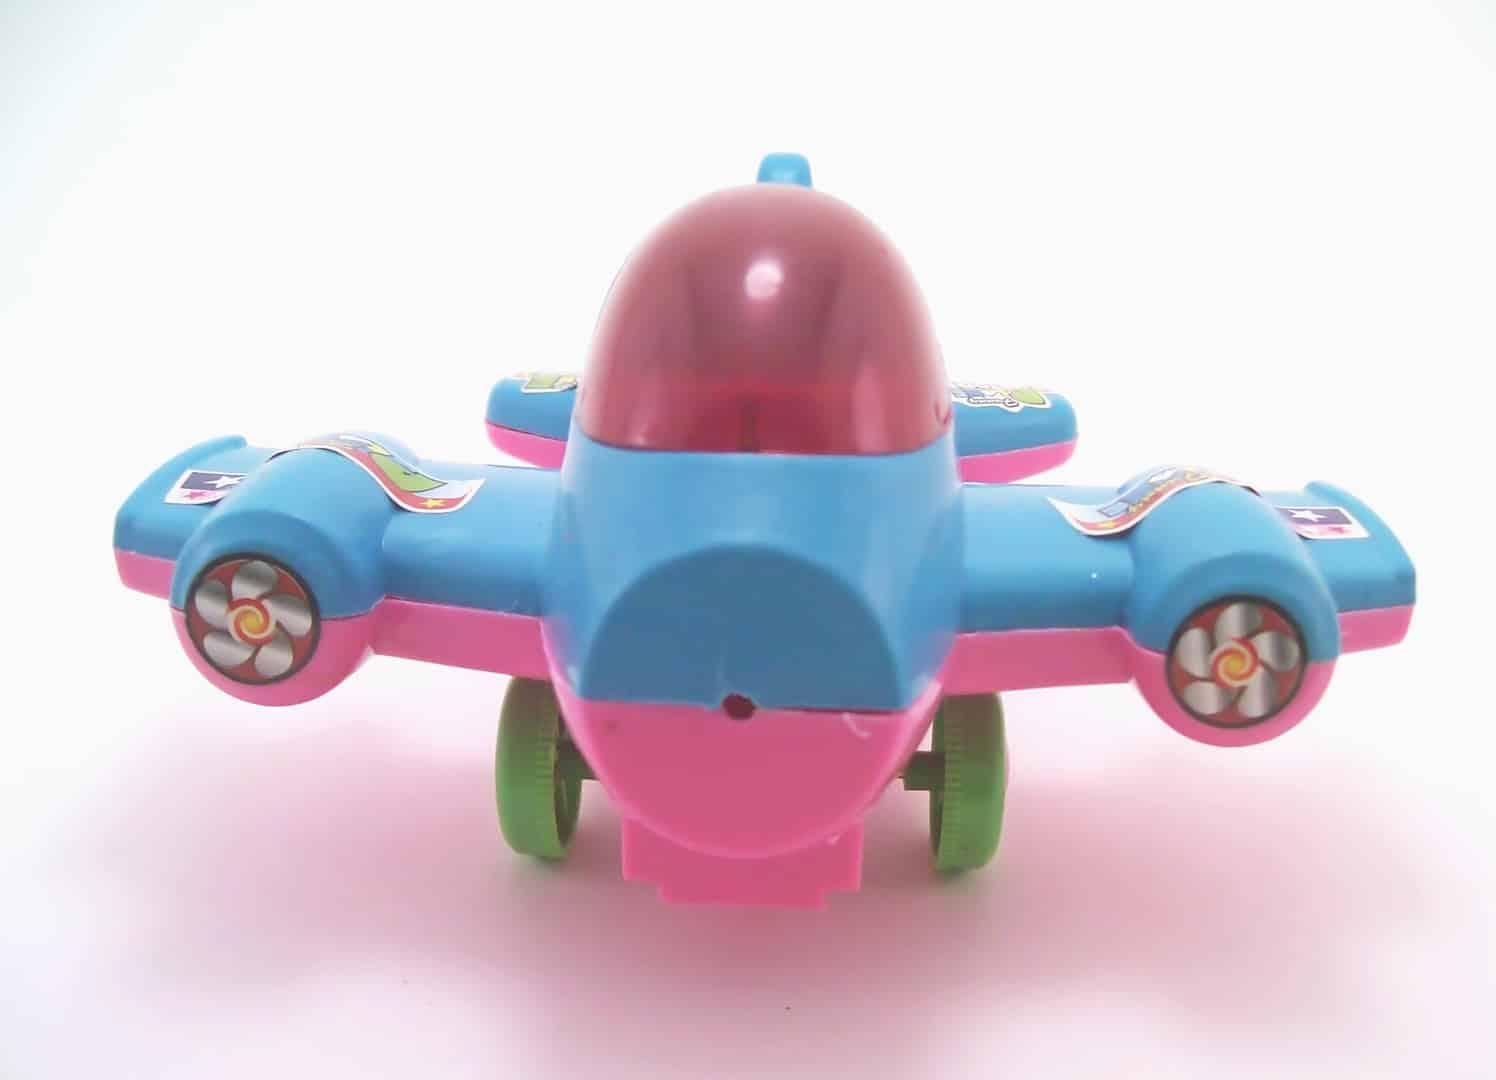 stockvault-toy-airplane107789